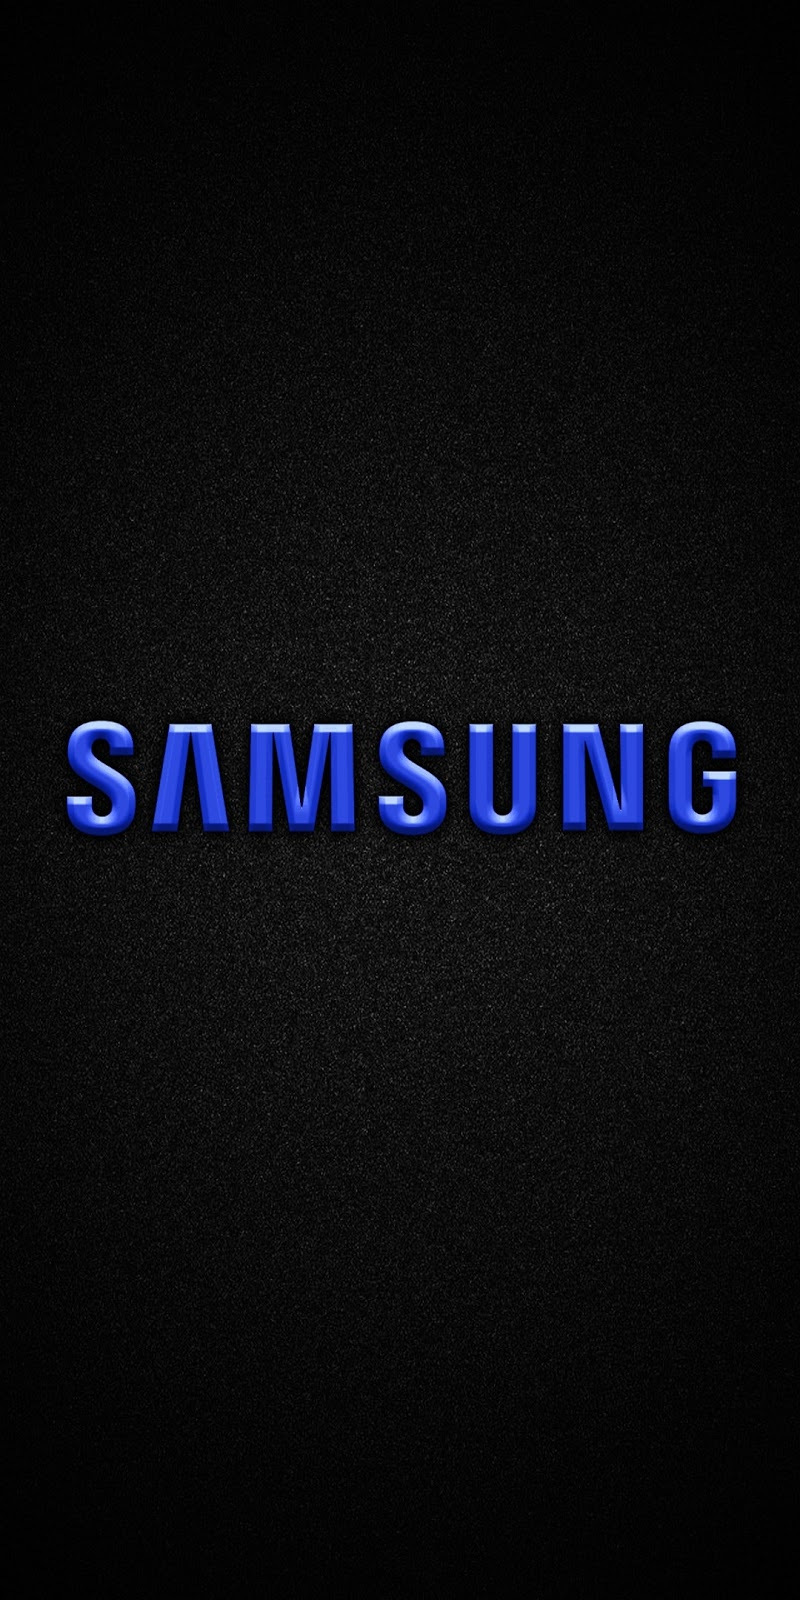 Phone Brand Logo Wallpapers Hd Ddwallpaper